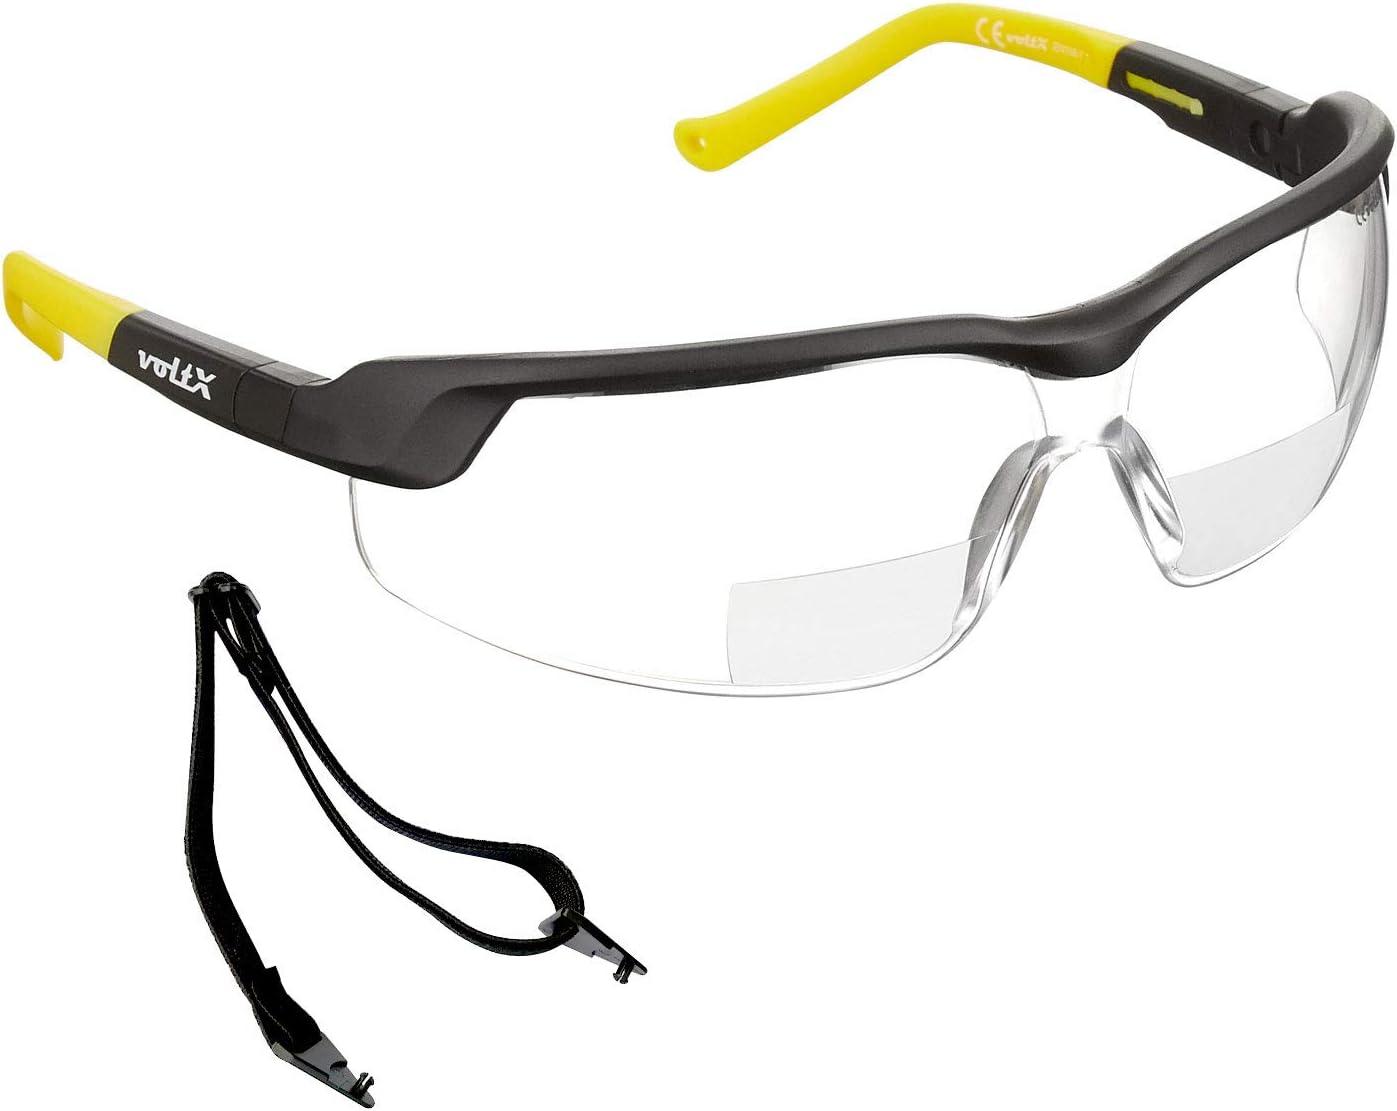 Scratch resistant Clear Lens +3.0 2020 model Anti fog coated CE EN166FT Certified UV400 Lens Bifocal Reading Safety Glasses voltX GT ADJUSTABLE Rigid Clamshell Safety Case.